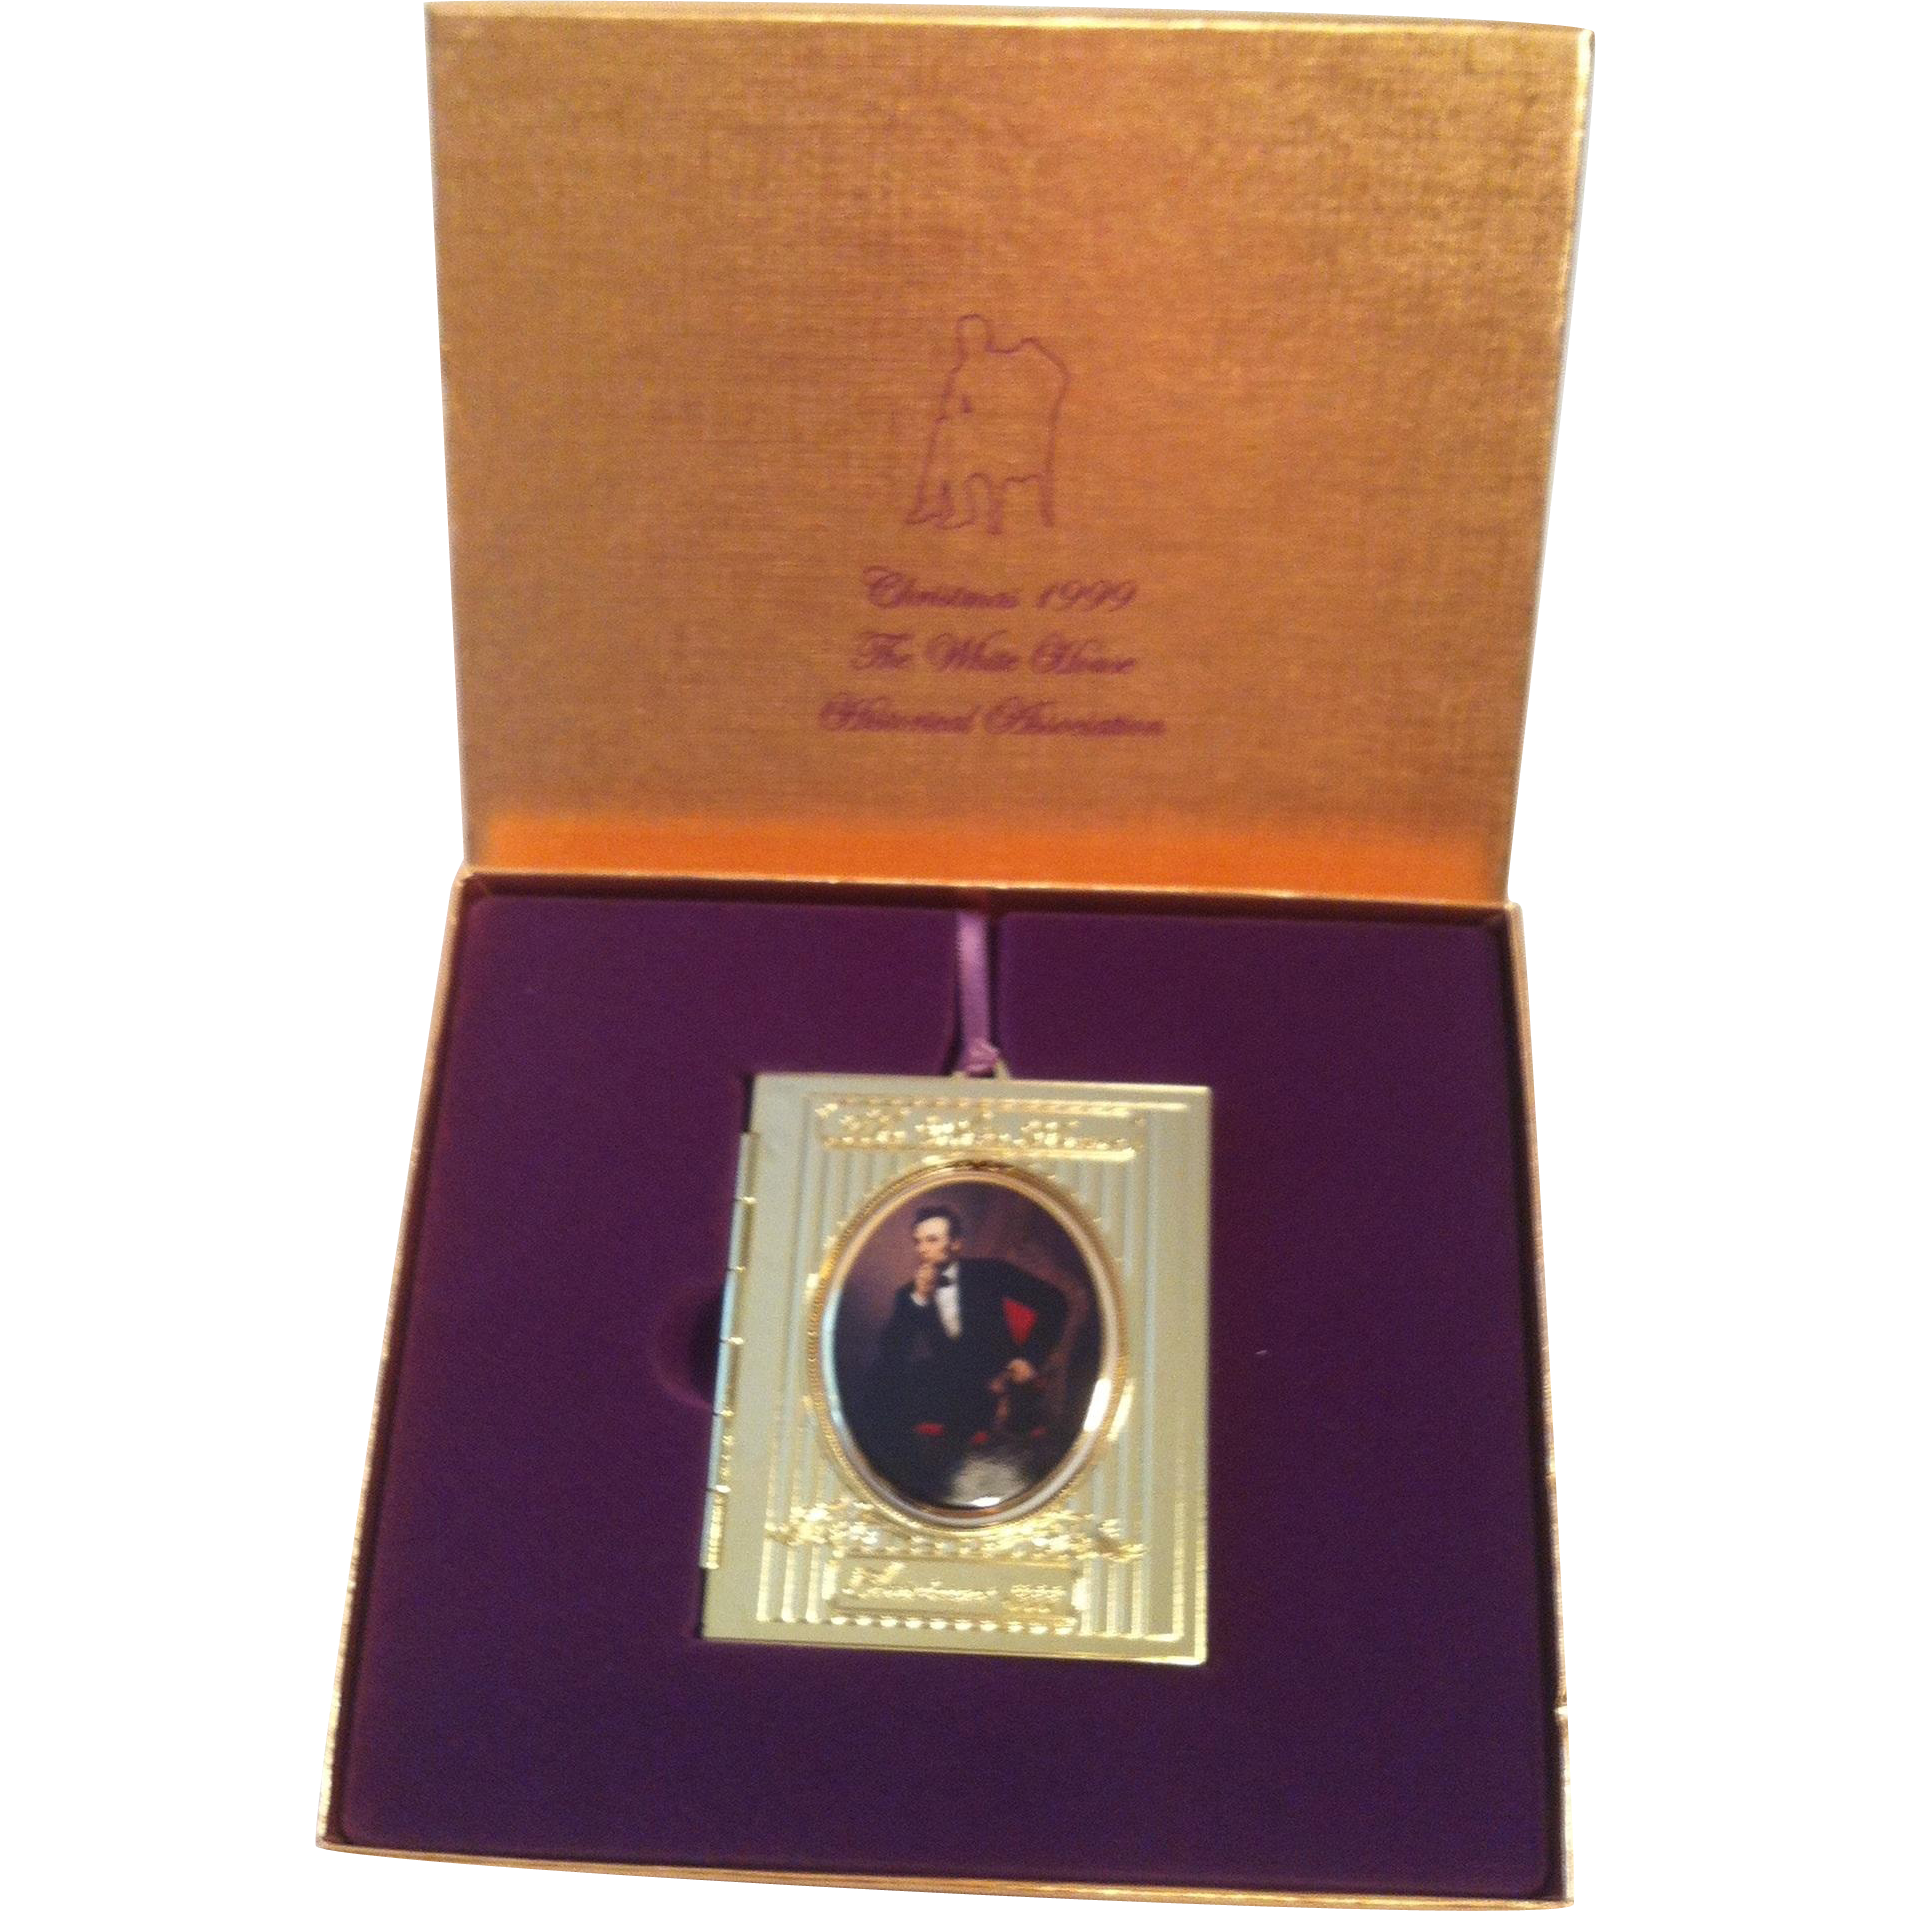 1999 White House Ornament ~Lincoln's